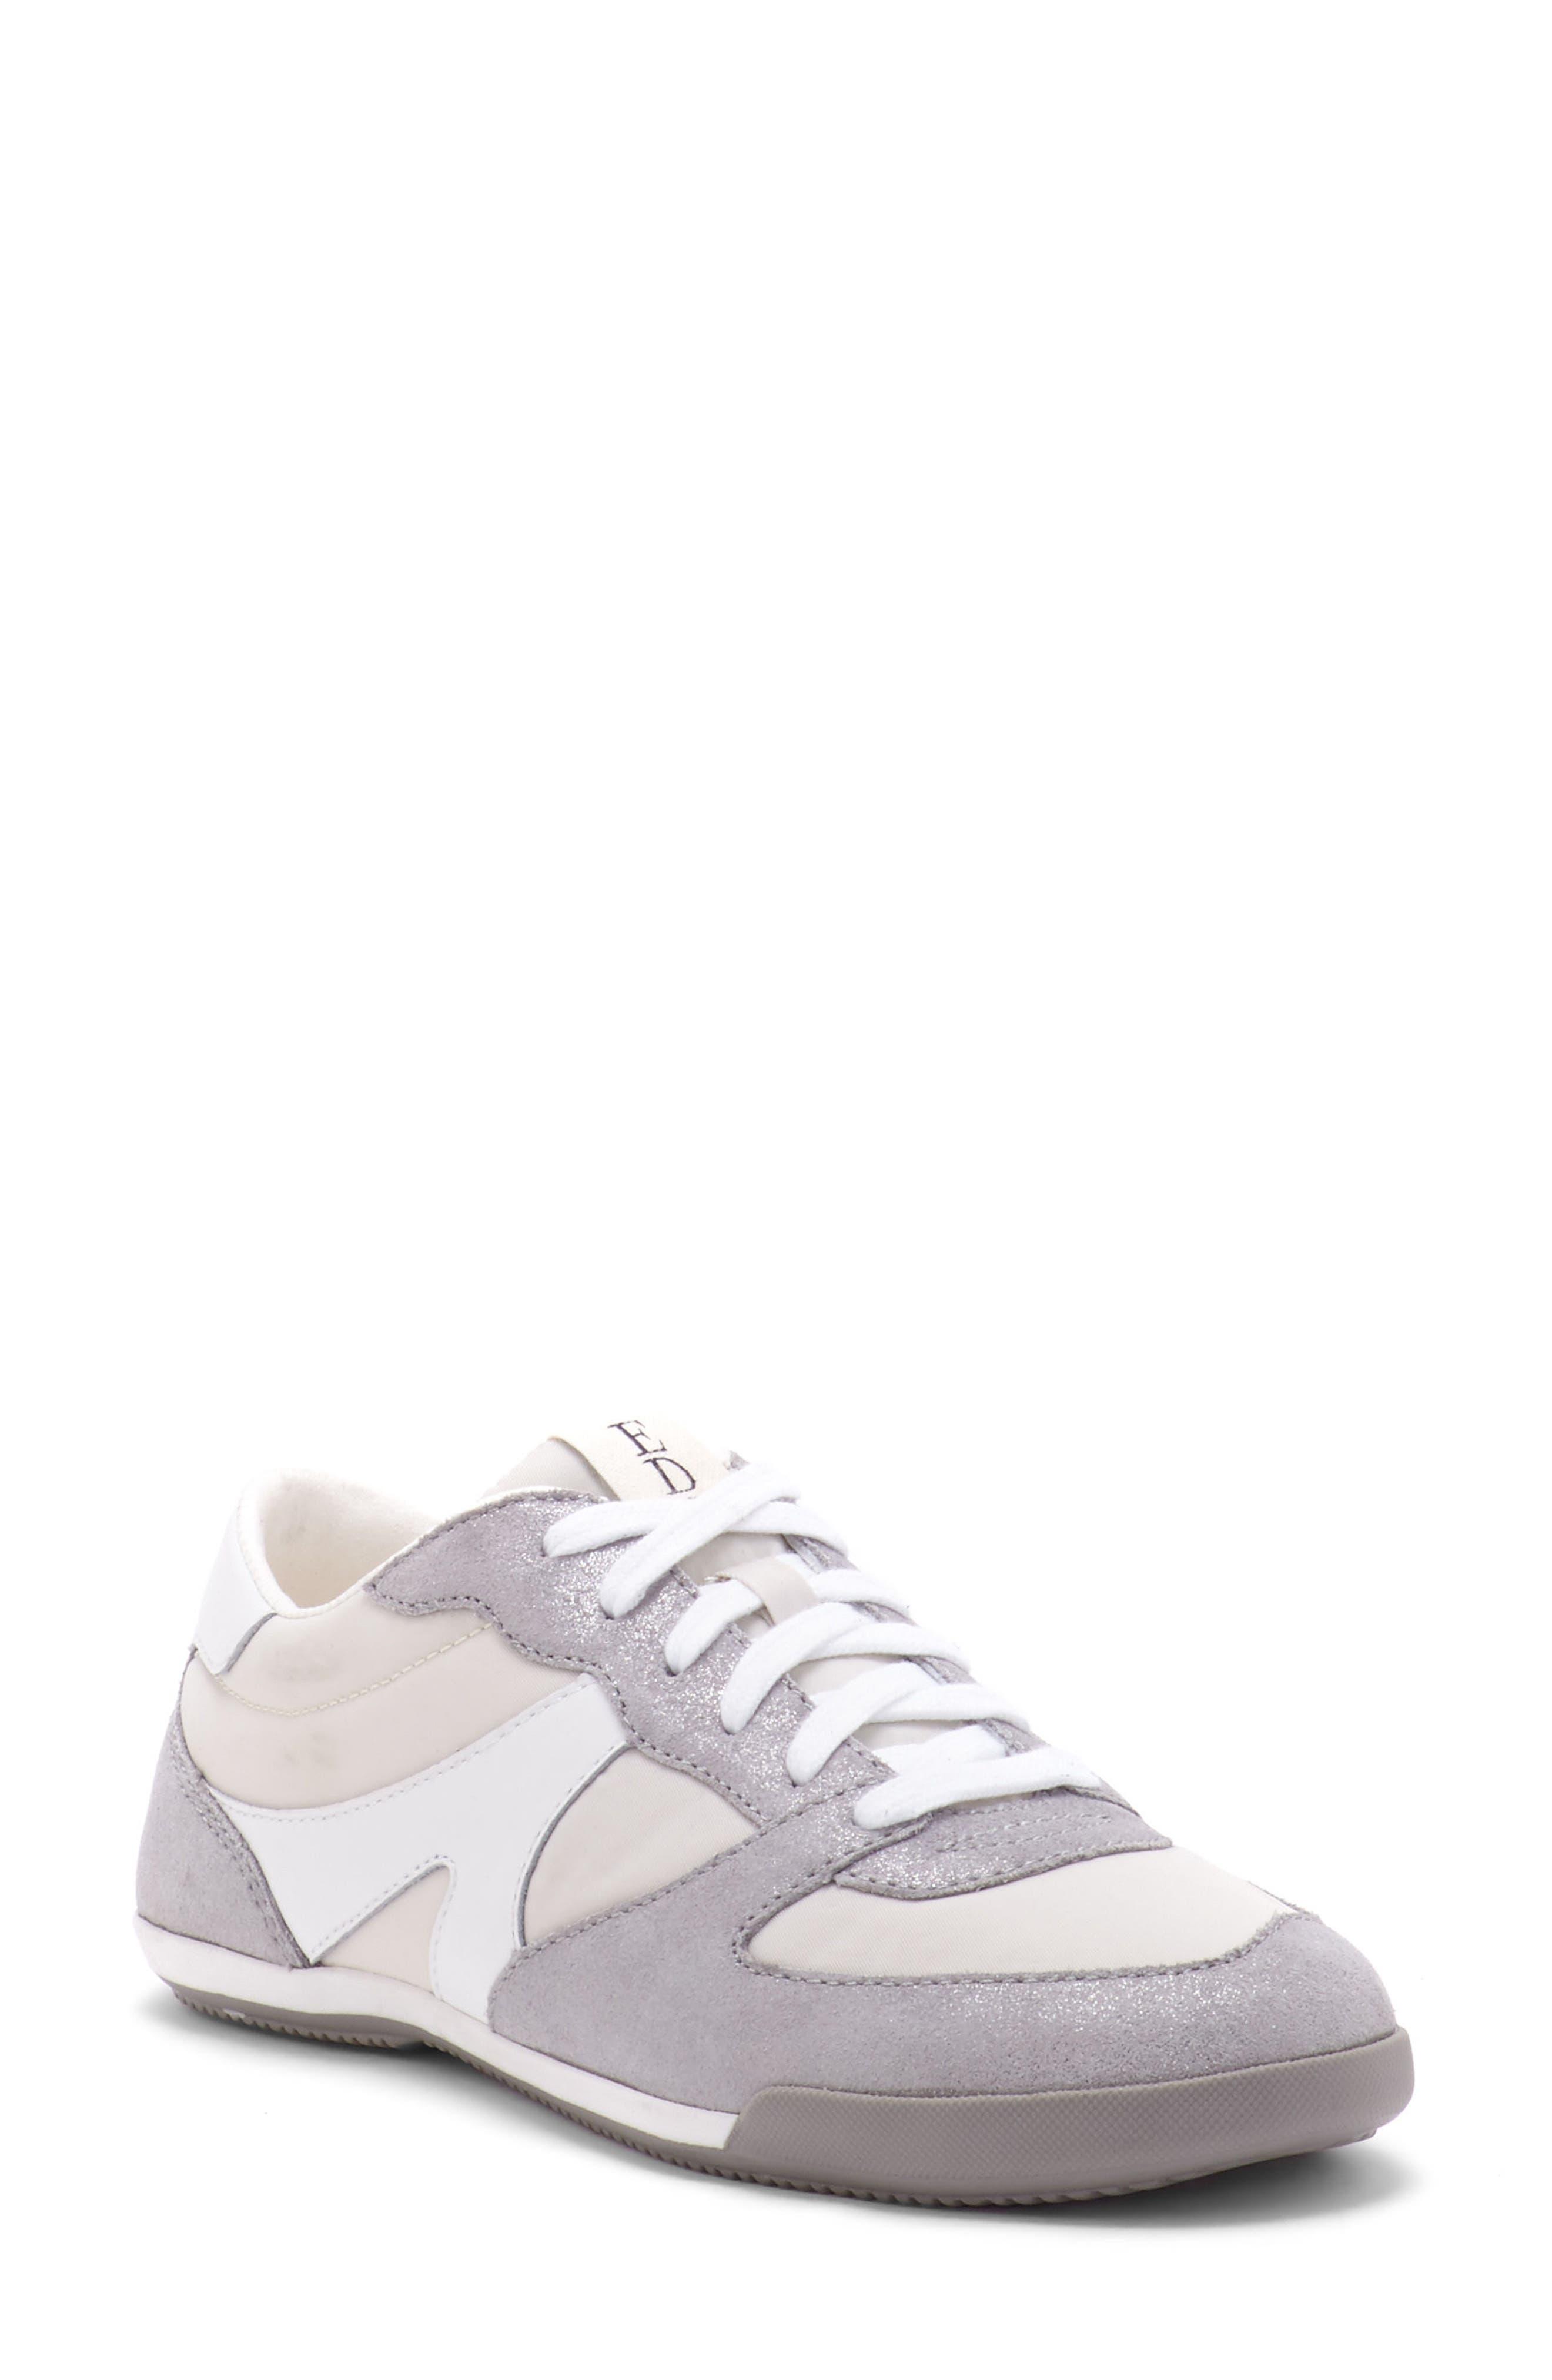 Ellert Sneaker,                         Main,                         color, 040